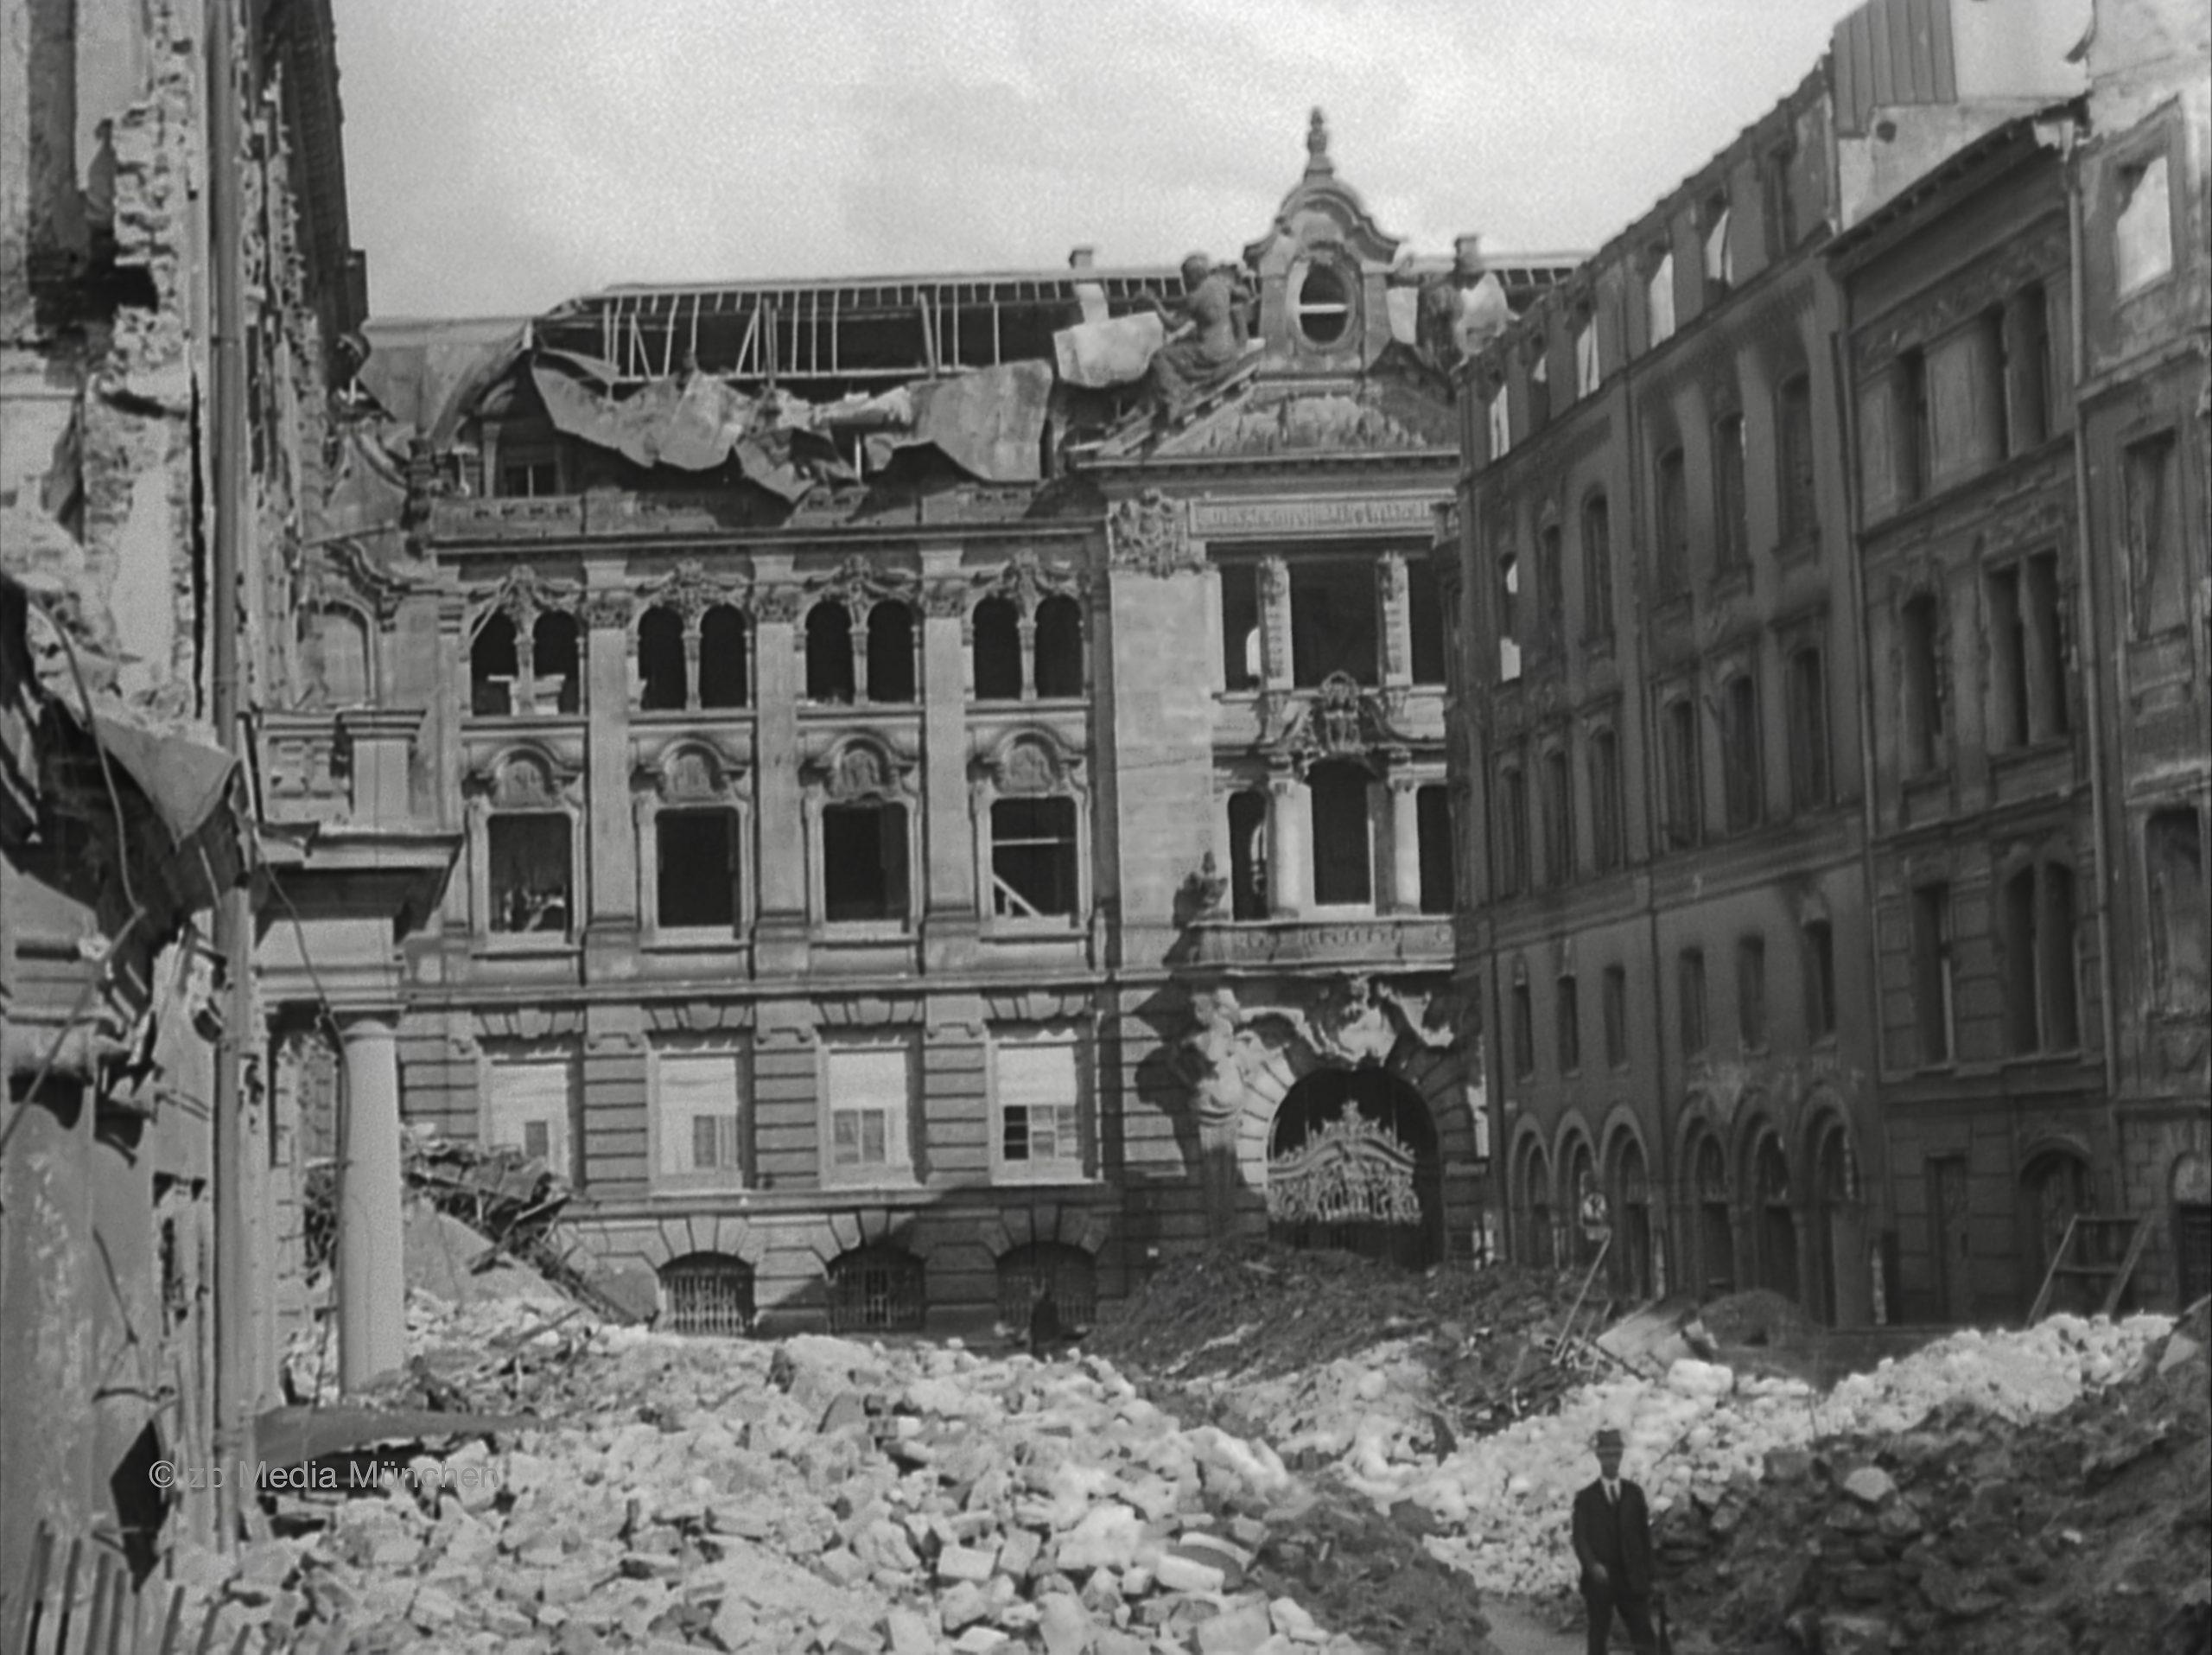 Residenz, Brunnenhof, München 5. Mai 1945